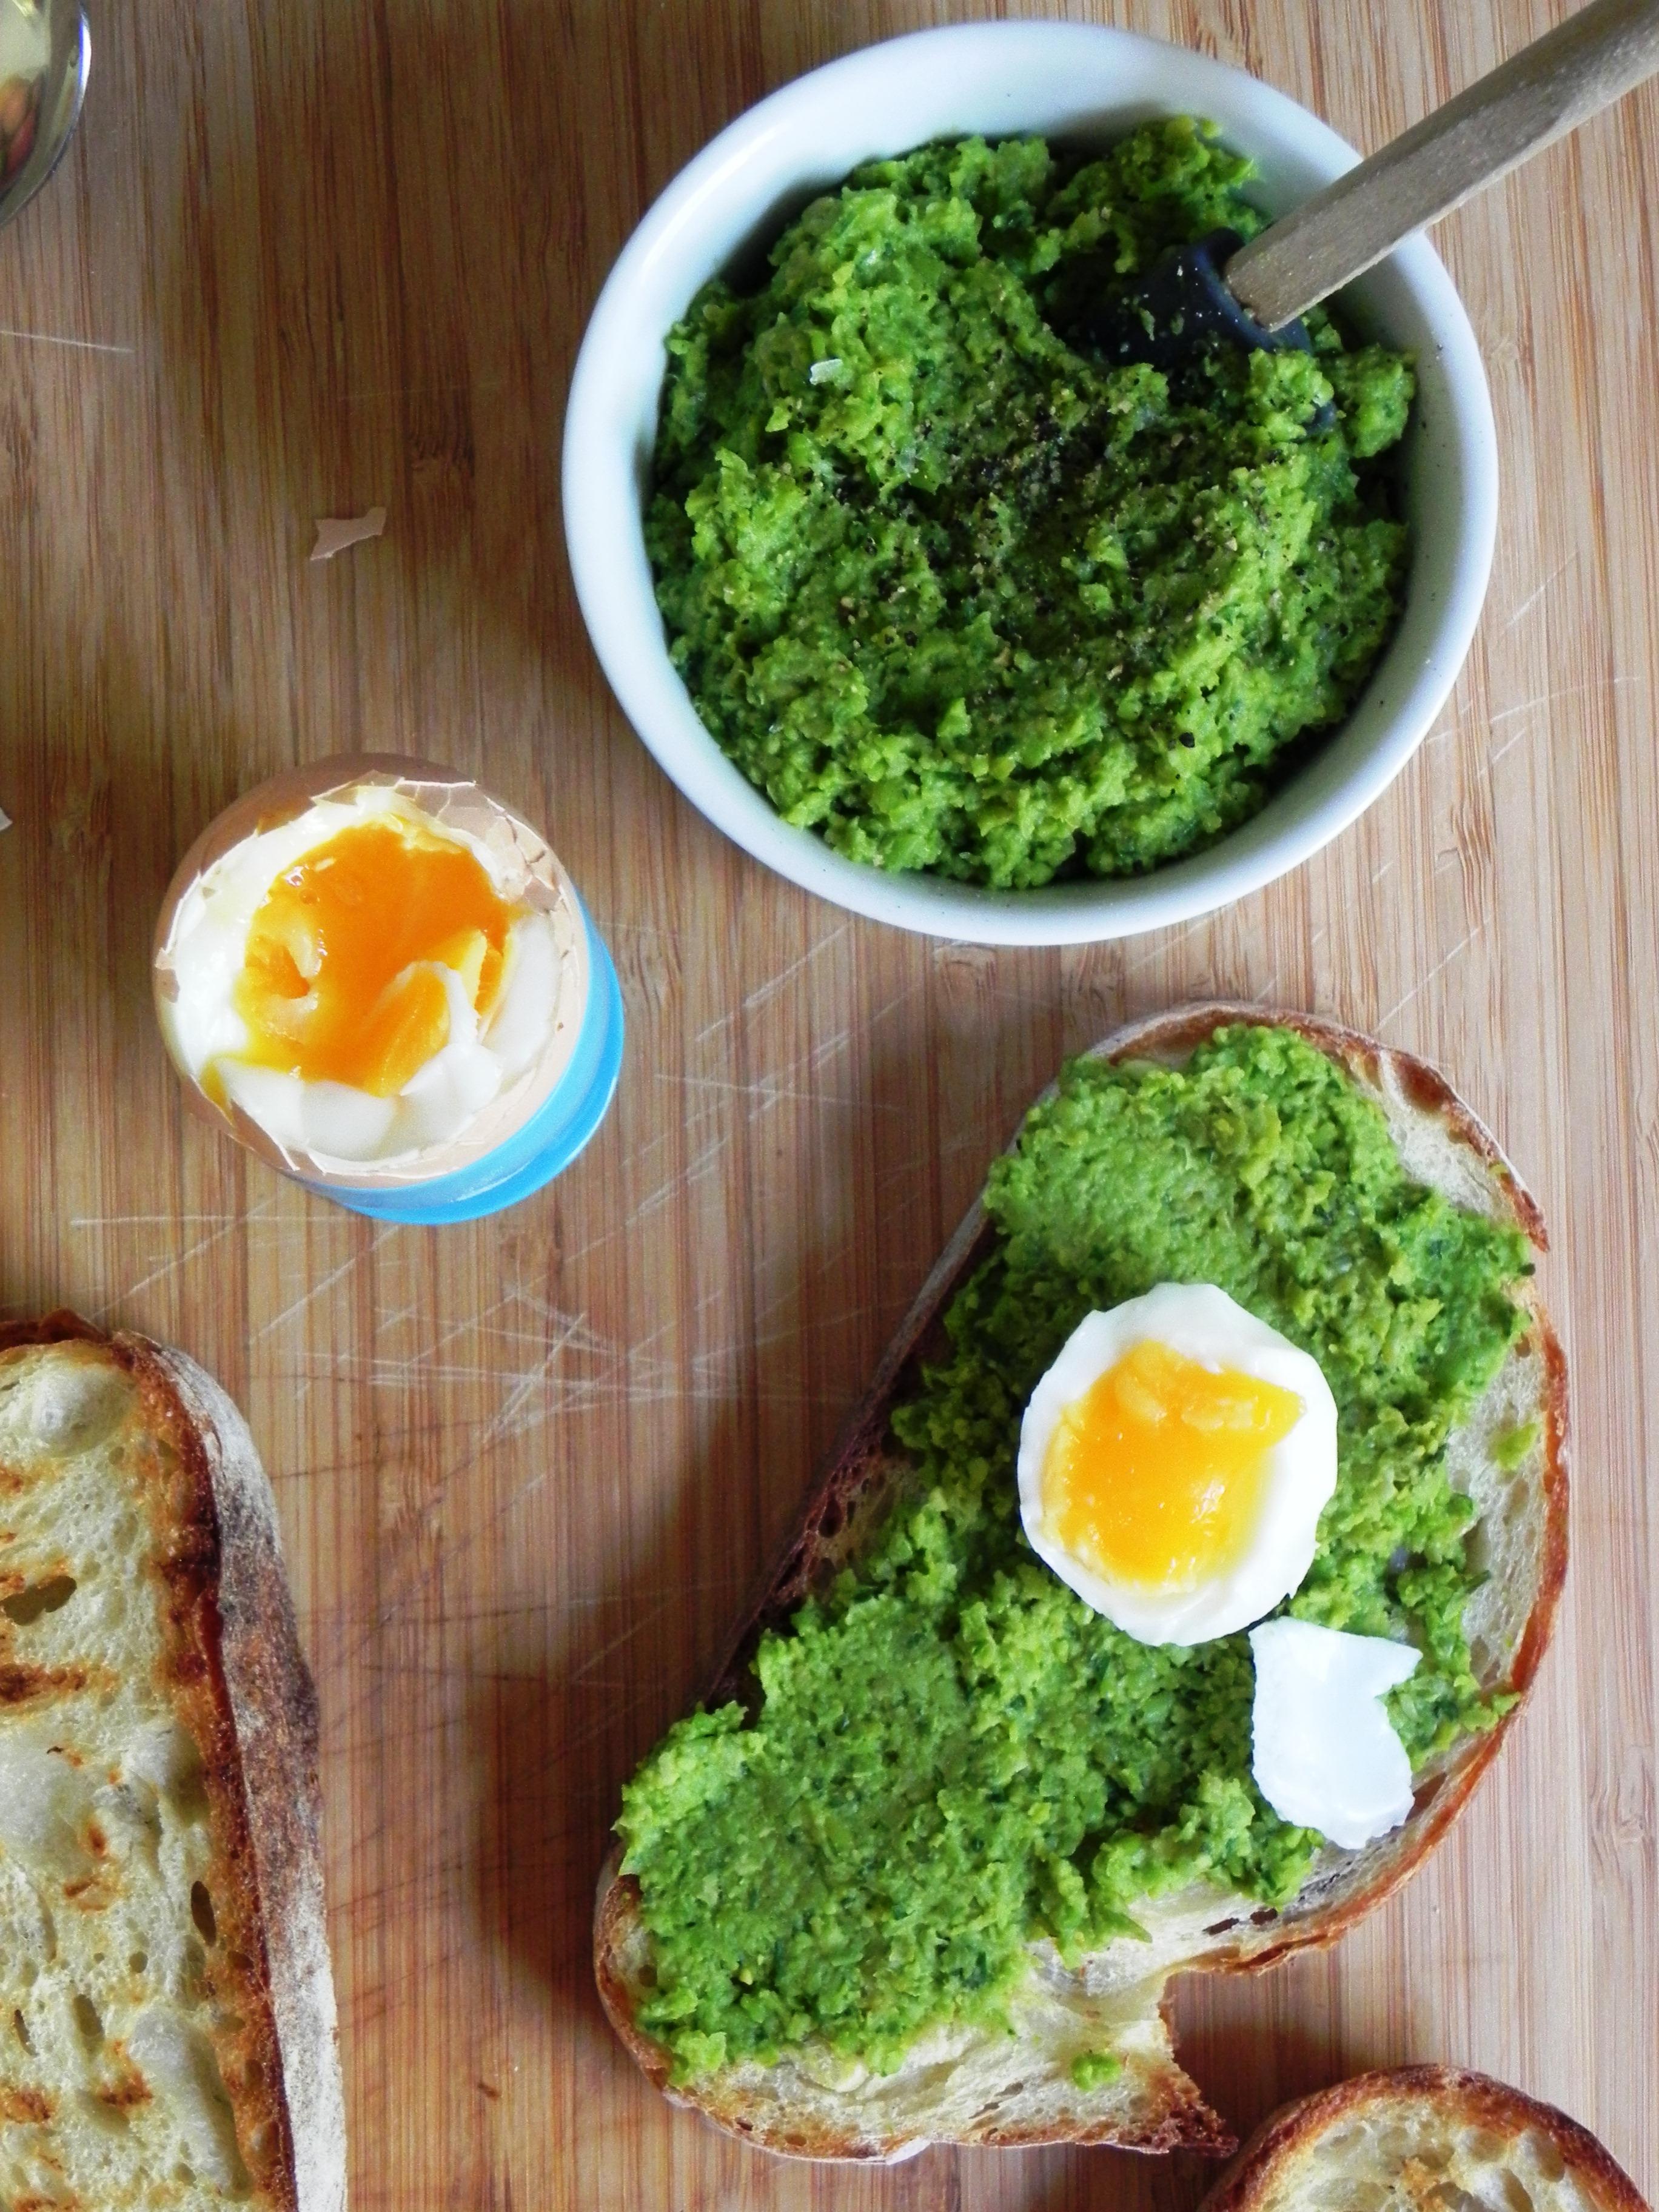 Mushy Peas: The Best Way to Use Frozen Peas? | VORACIOUS VEGGIE